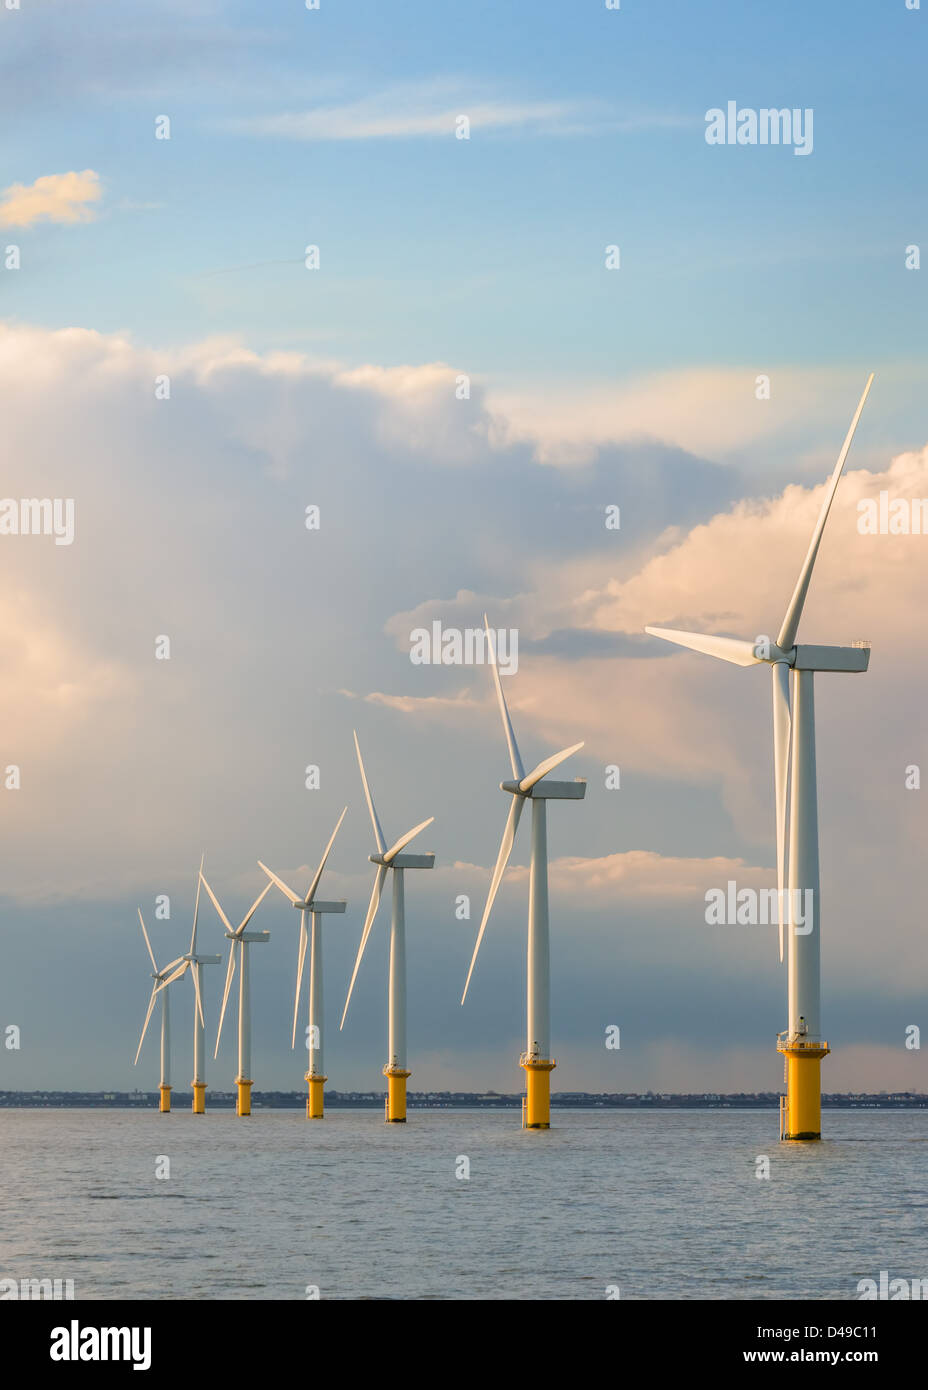 Wind generators farm at sea - Stock Image